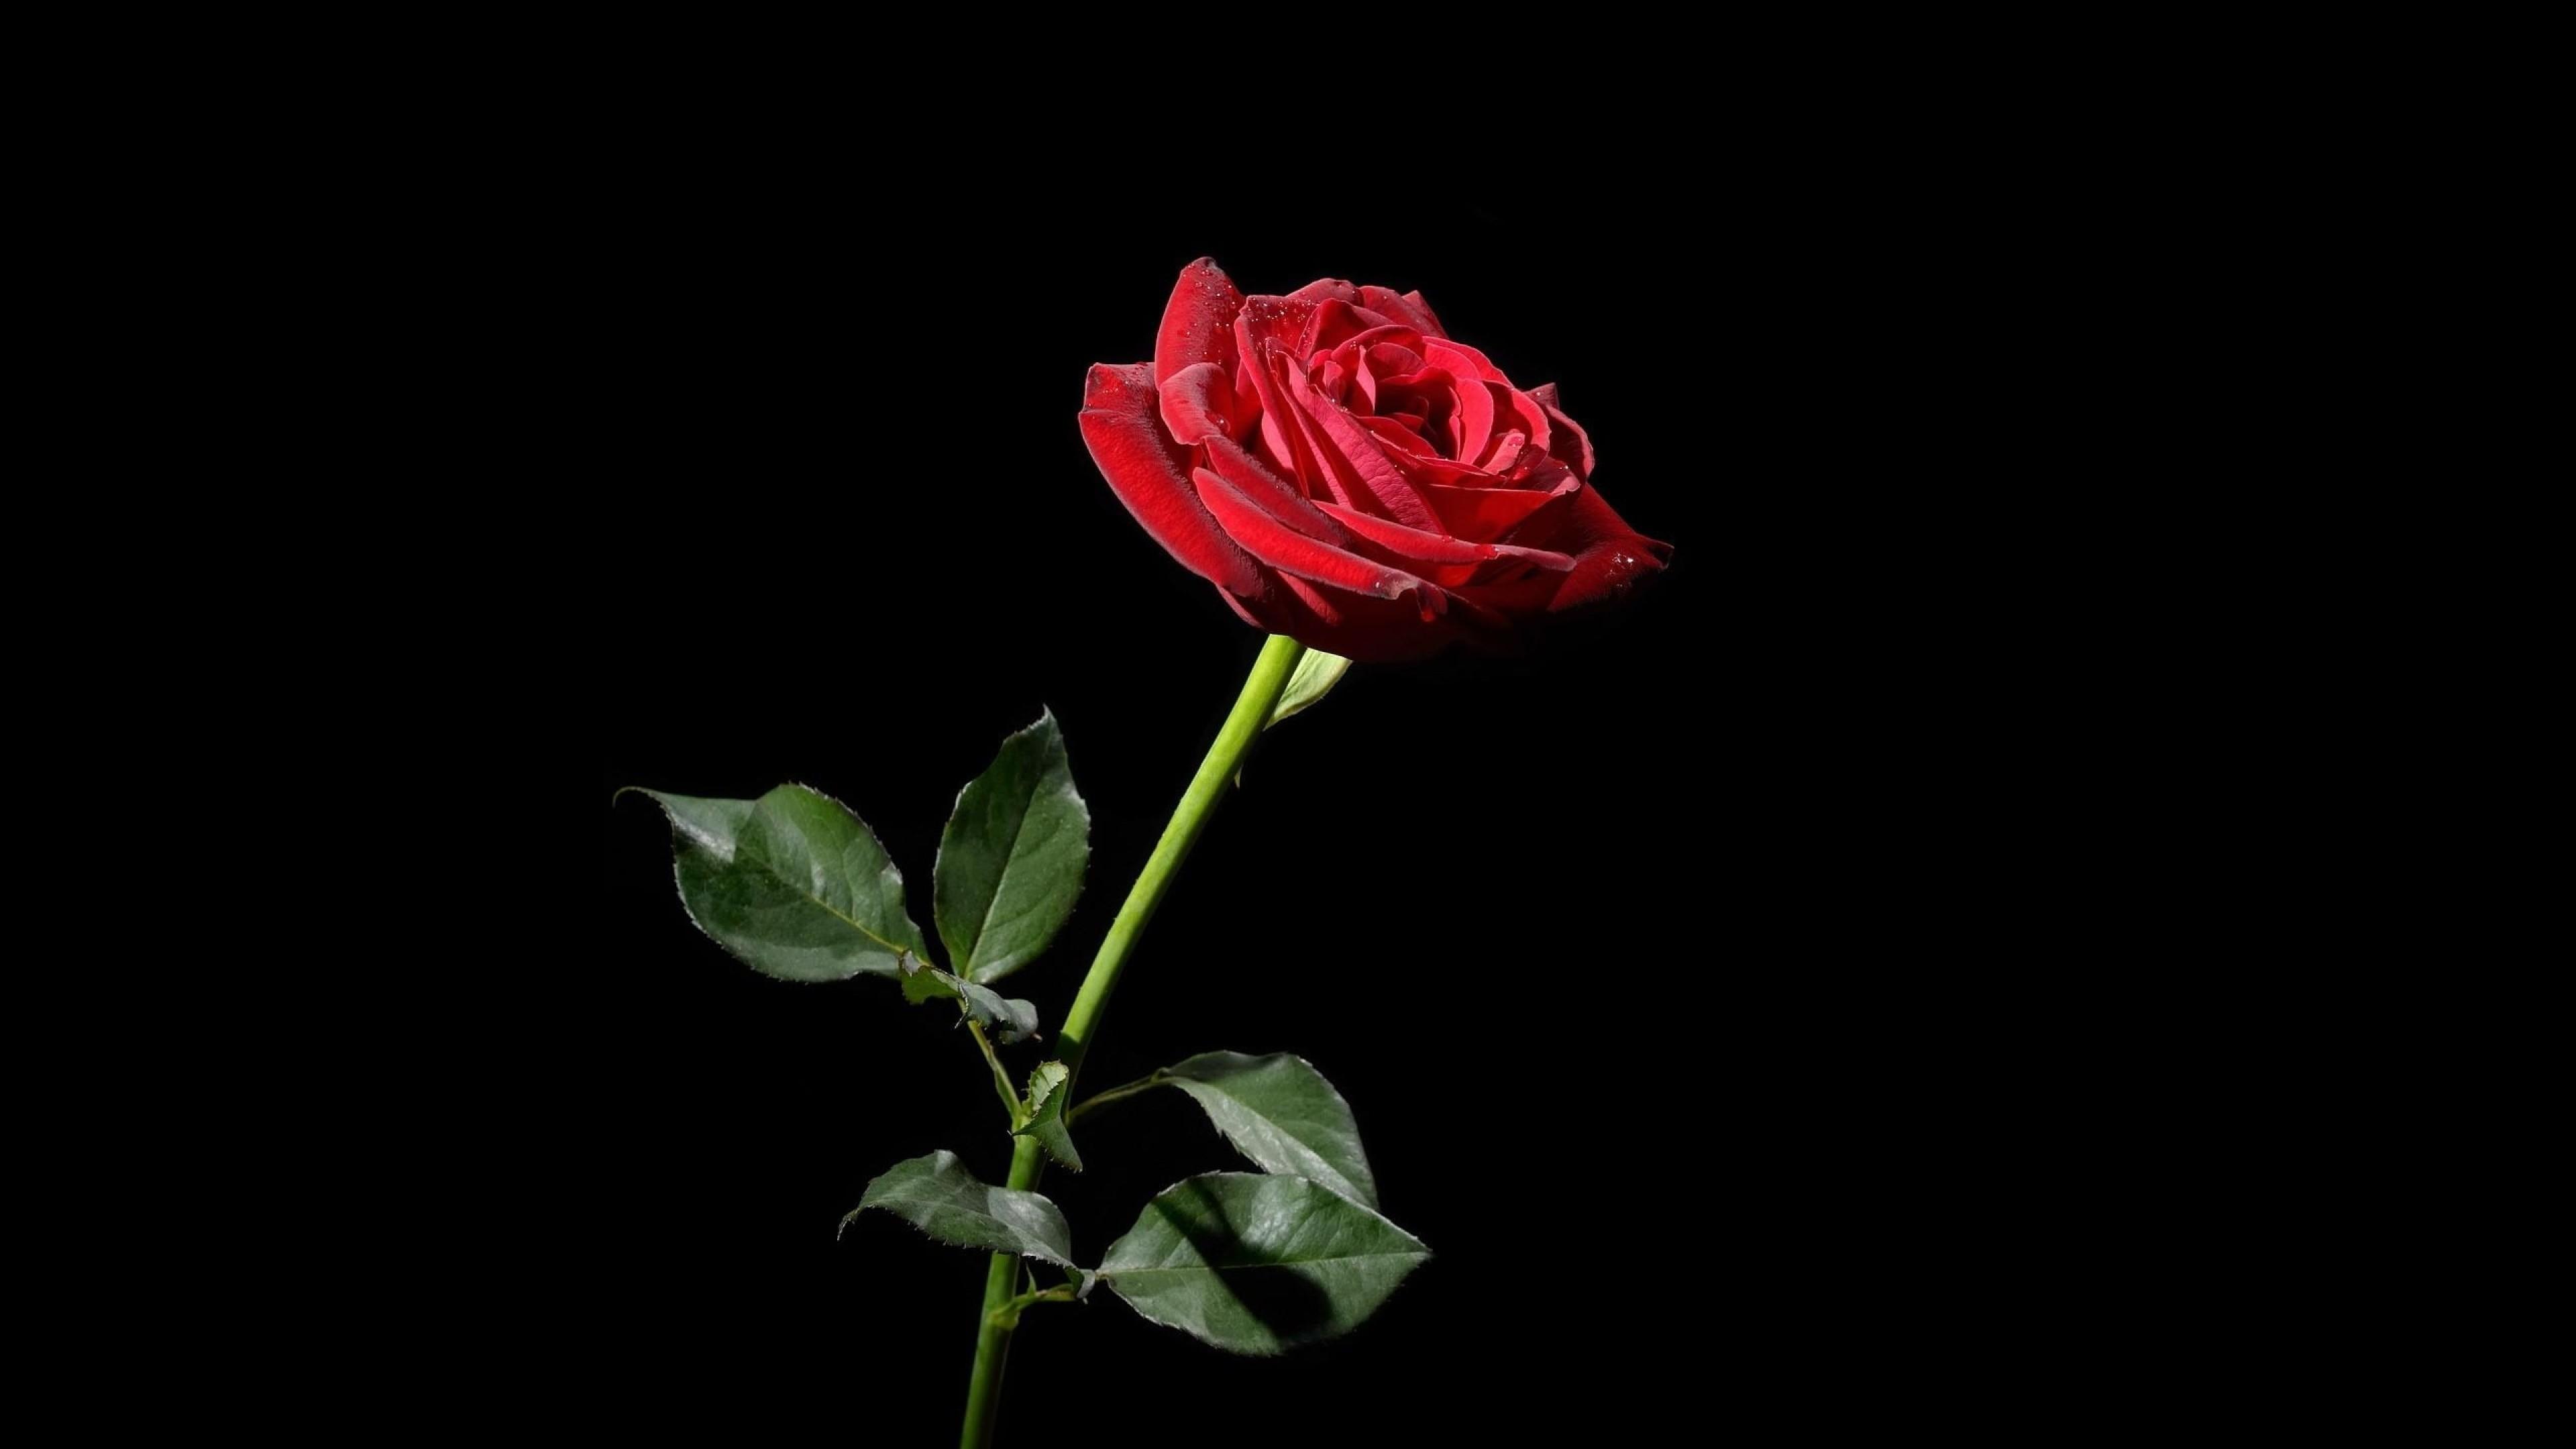 Wallpaper rose, red, flower, black background